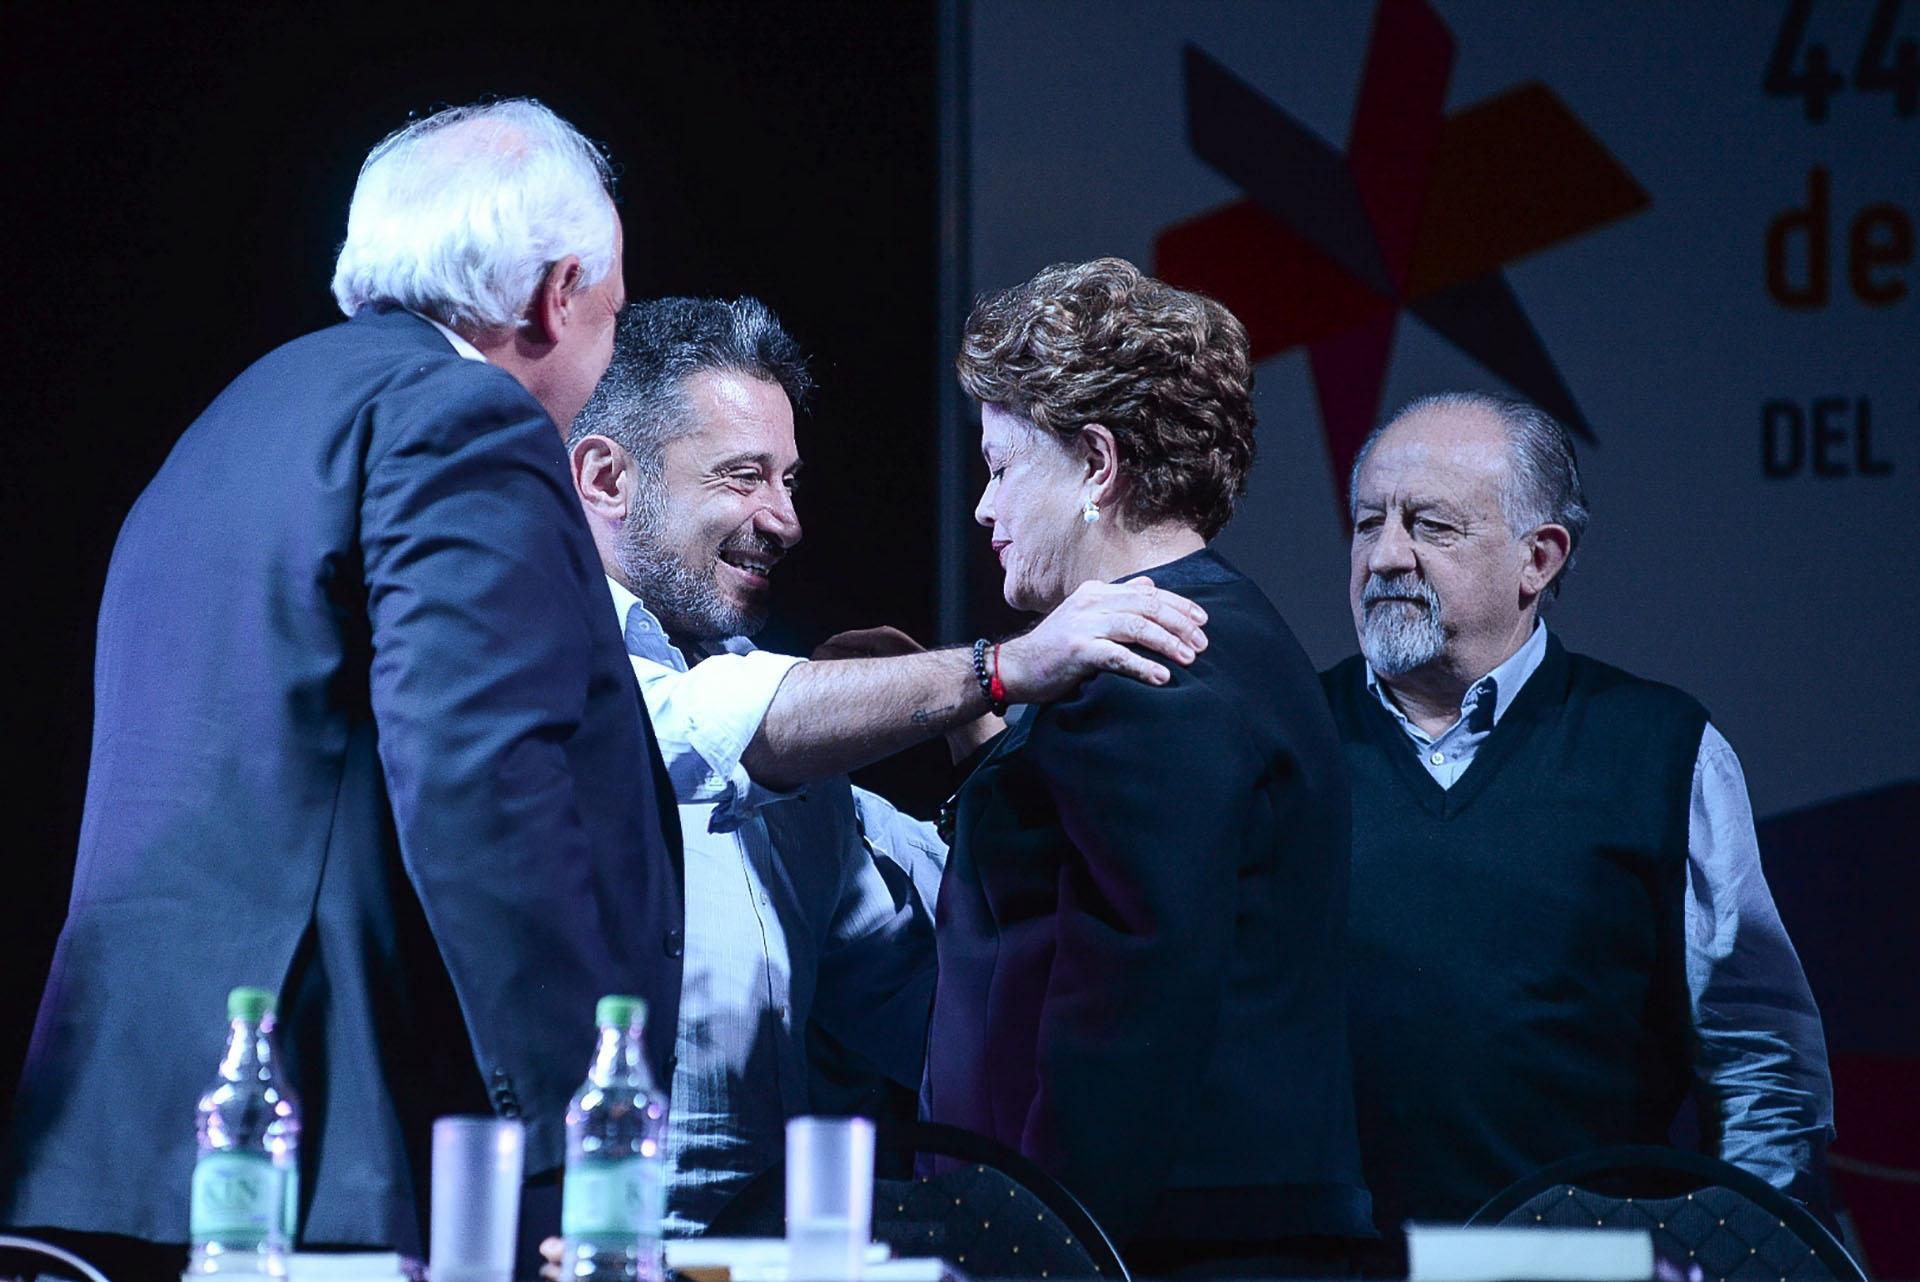 Hugo Yasky, titular de la CTA, mira como Santa María saluda a Rousseff